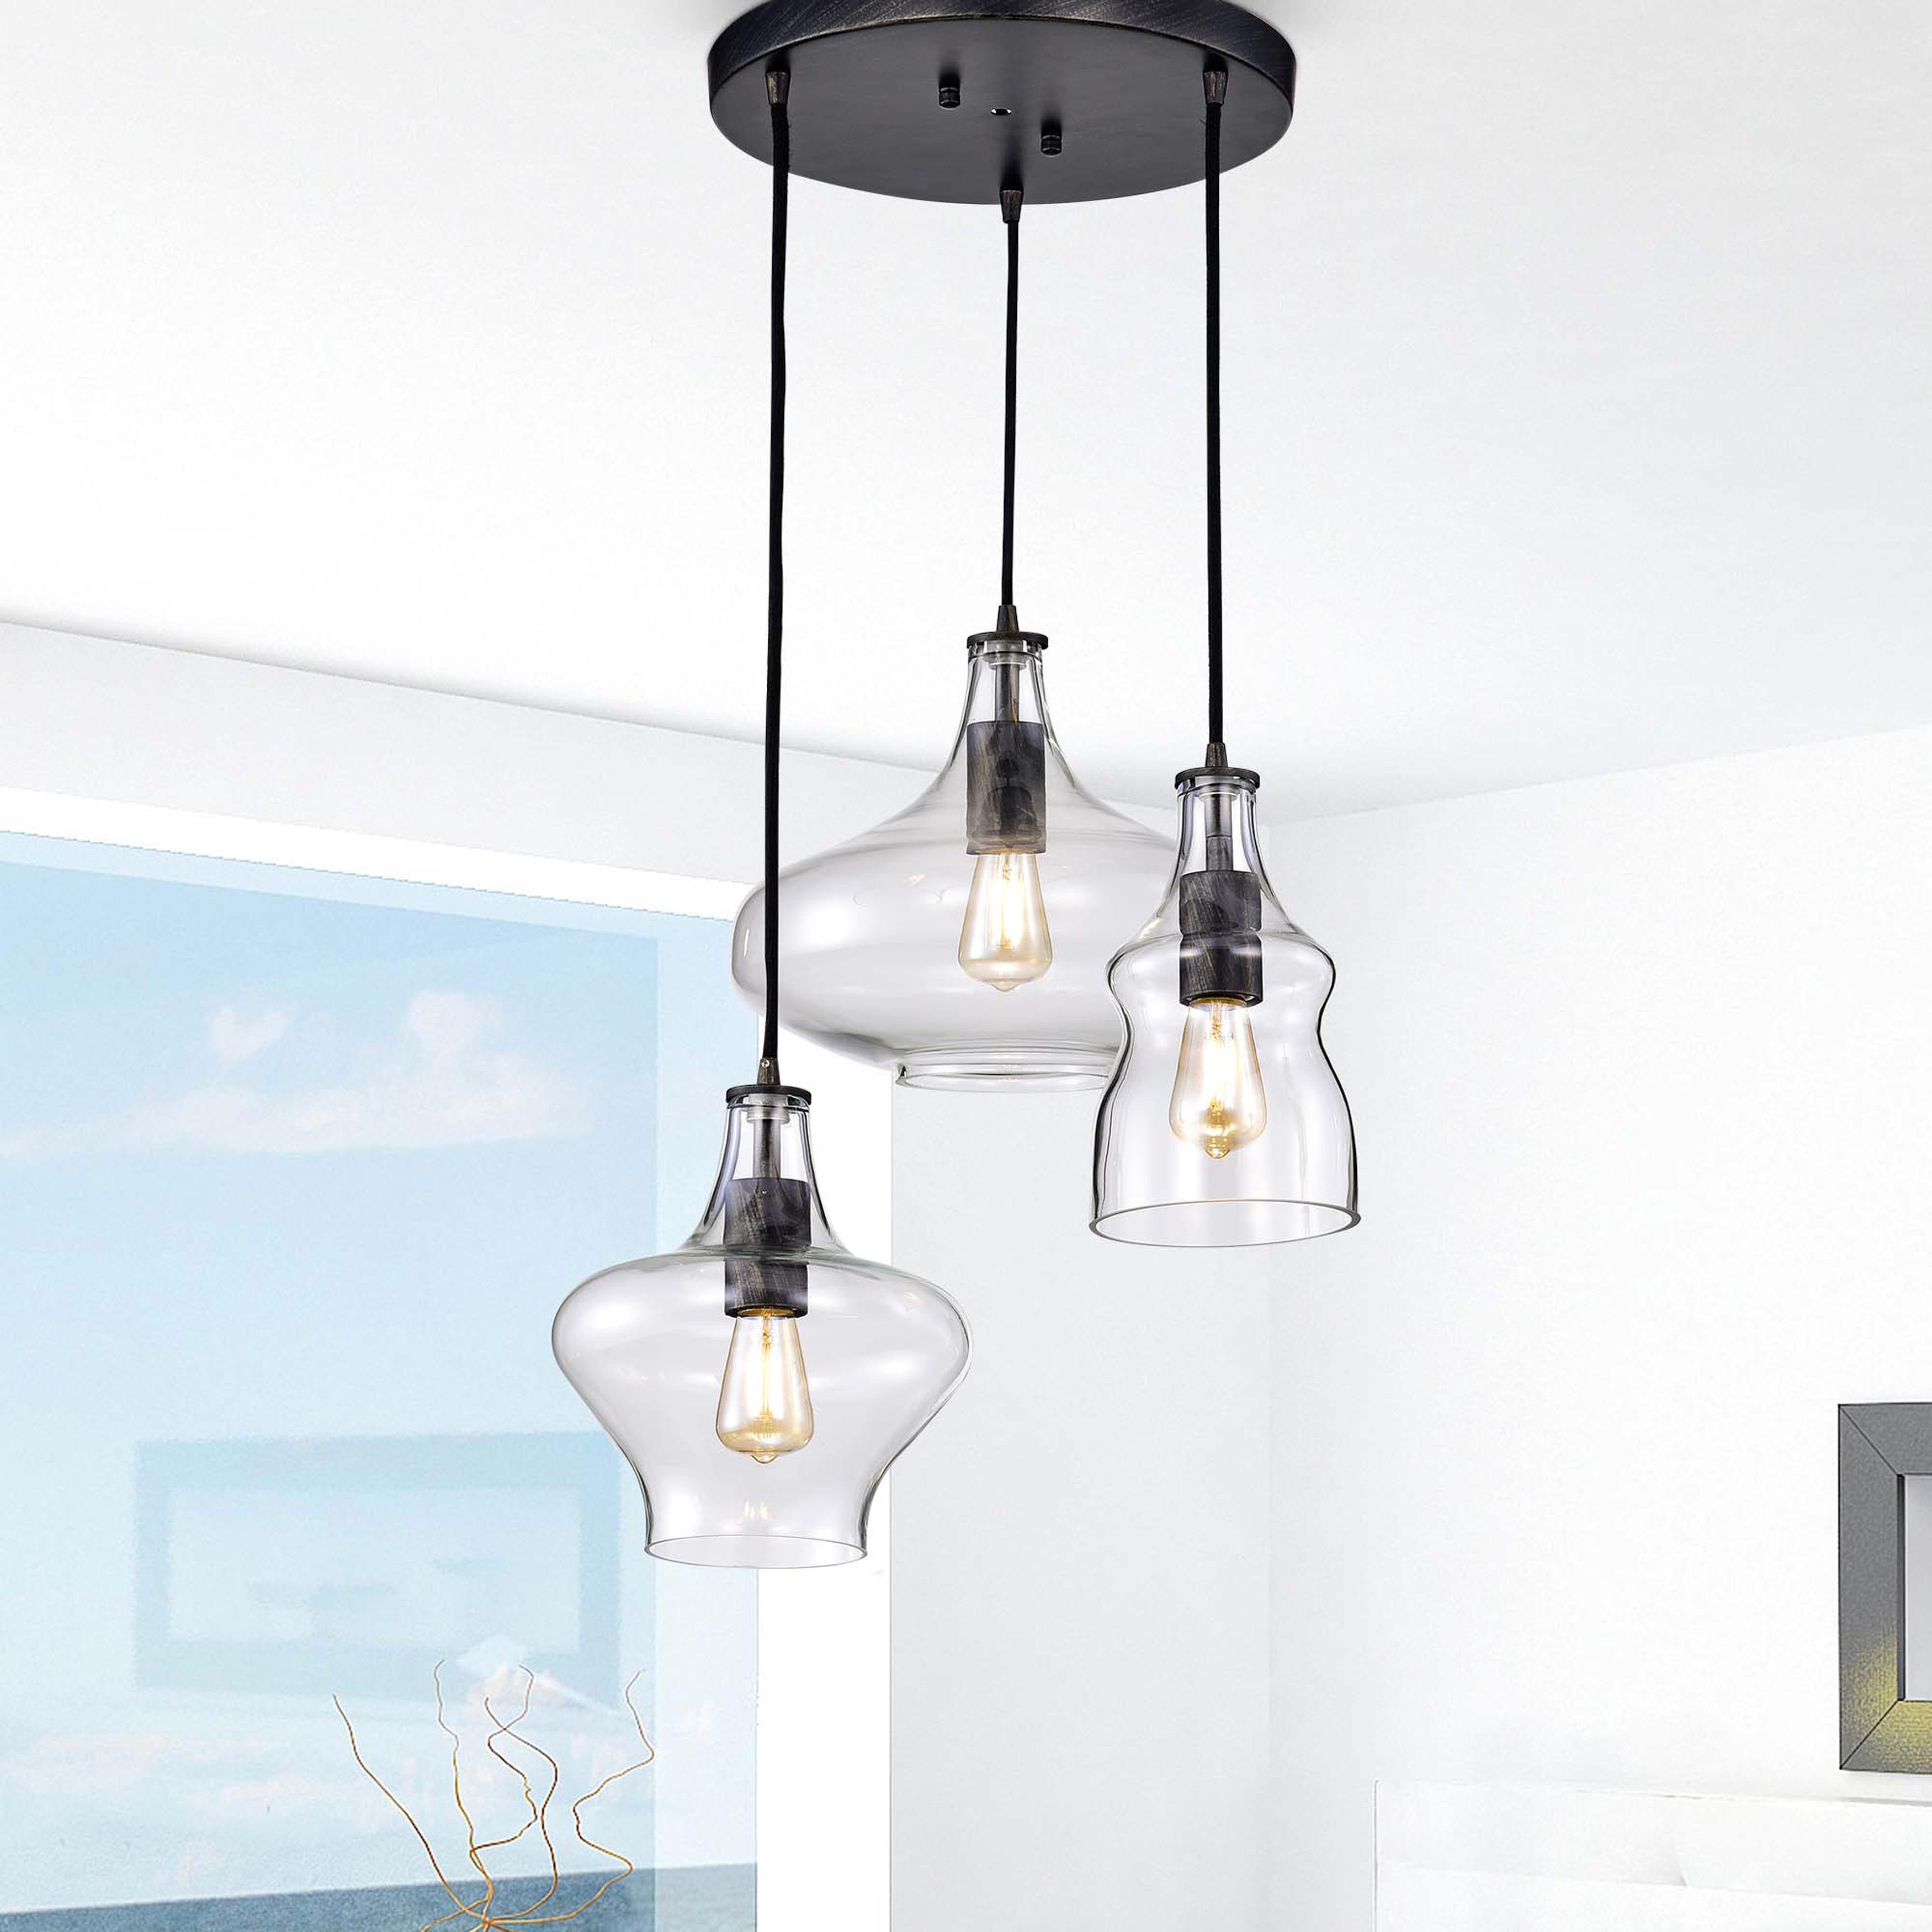 Glass Ceiling Lights At Com Our Best Lighting Deals